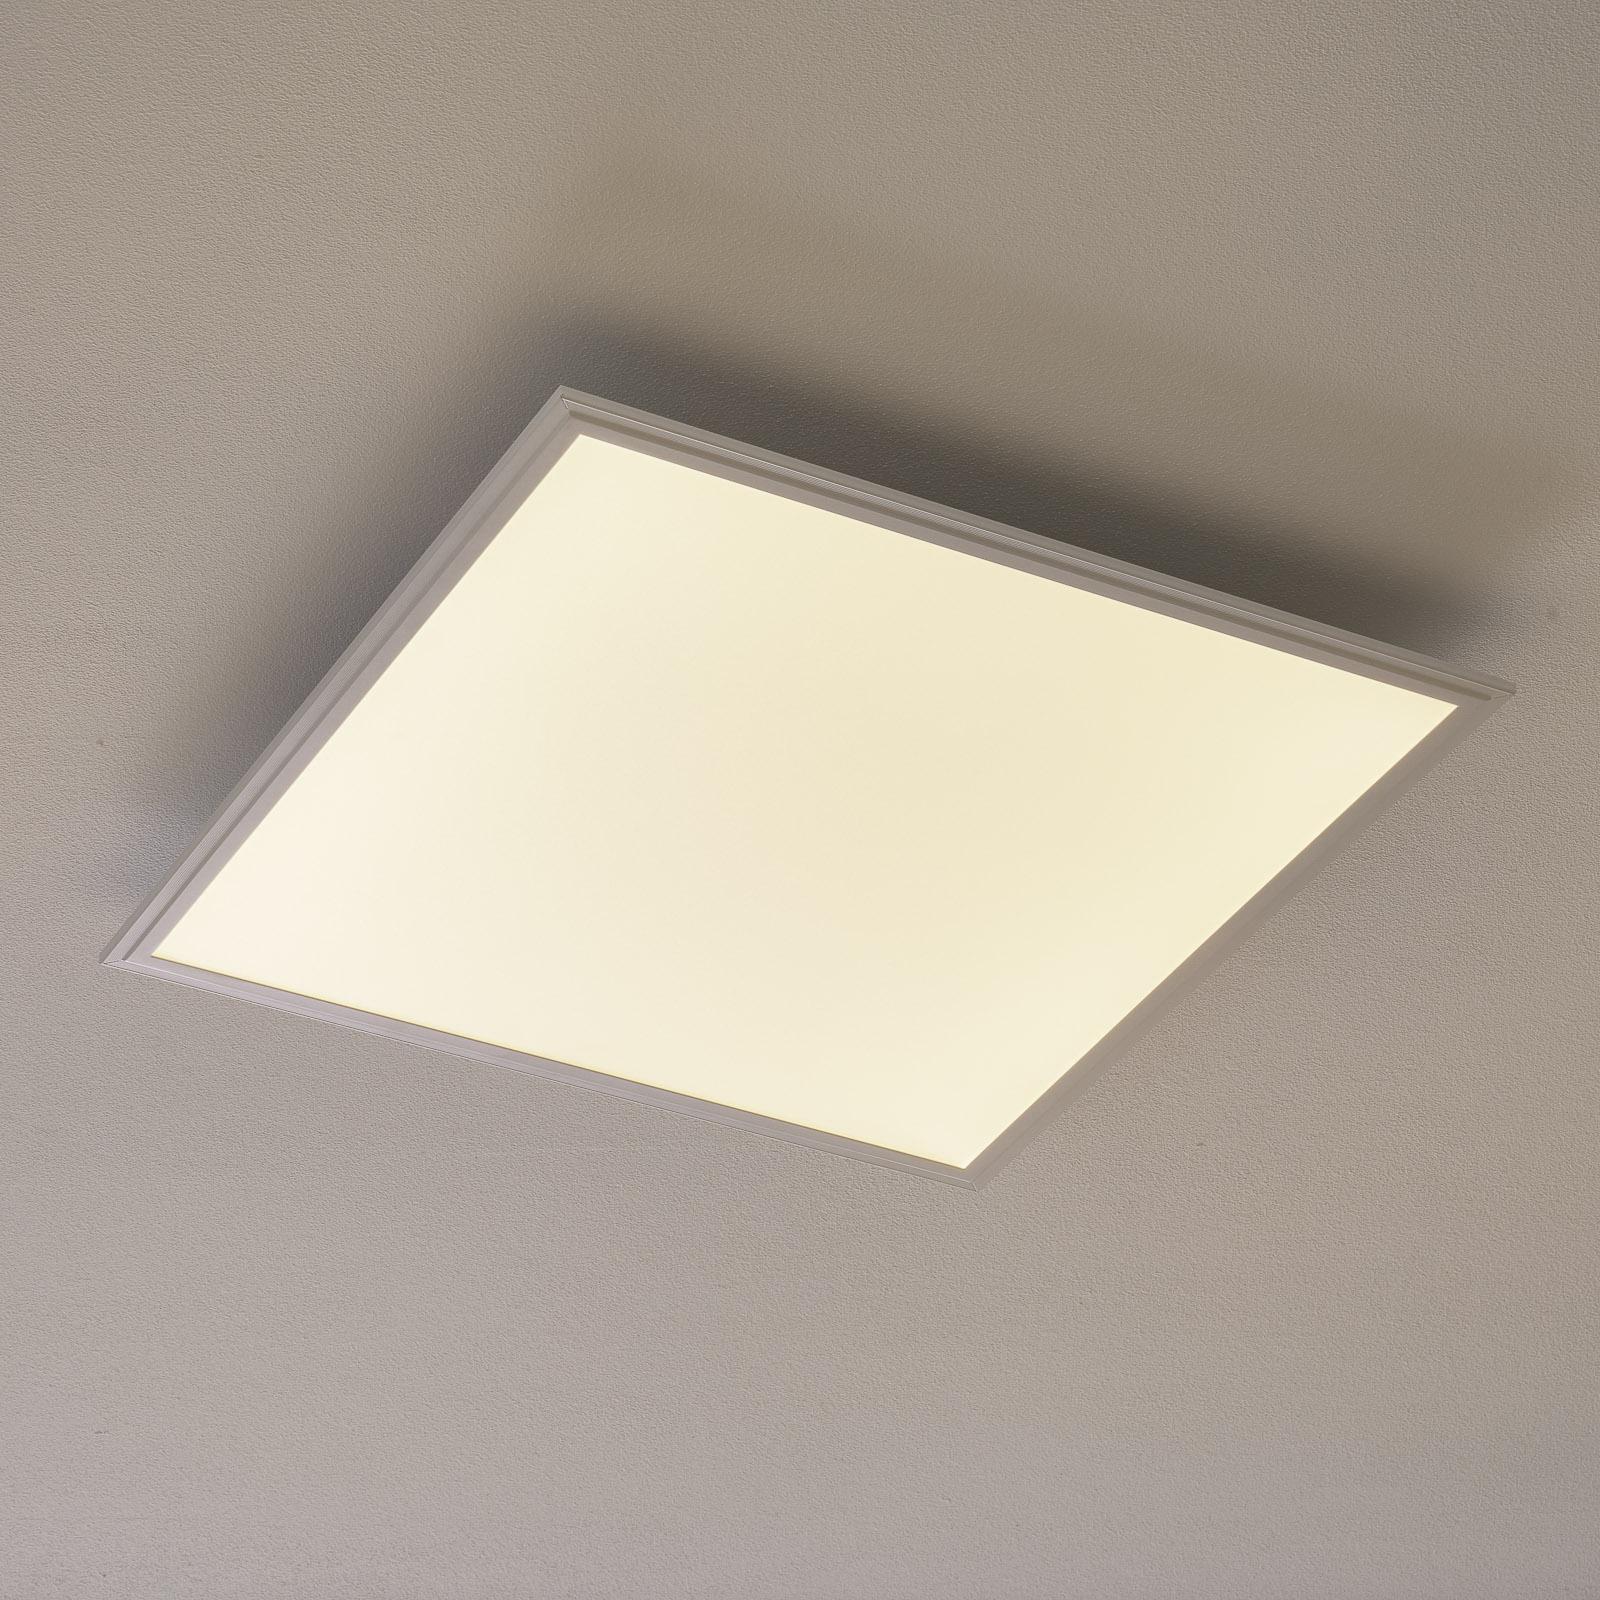 Eglo connect Salobrena-C LED-panel, 59,5 x 59,5 cm